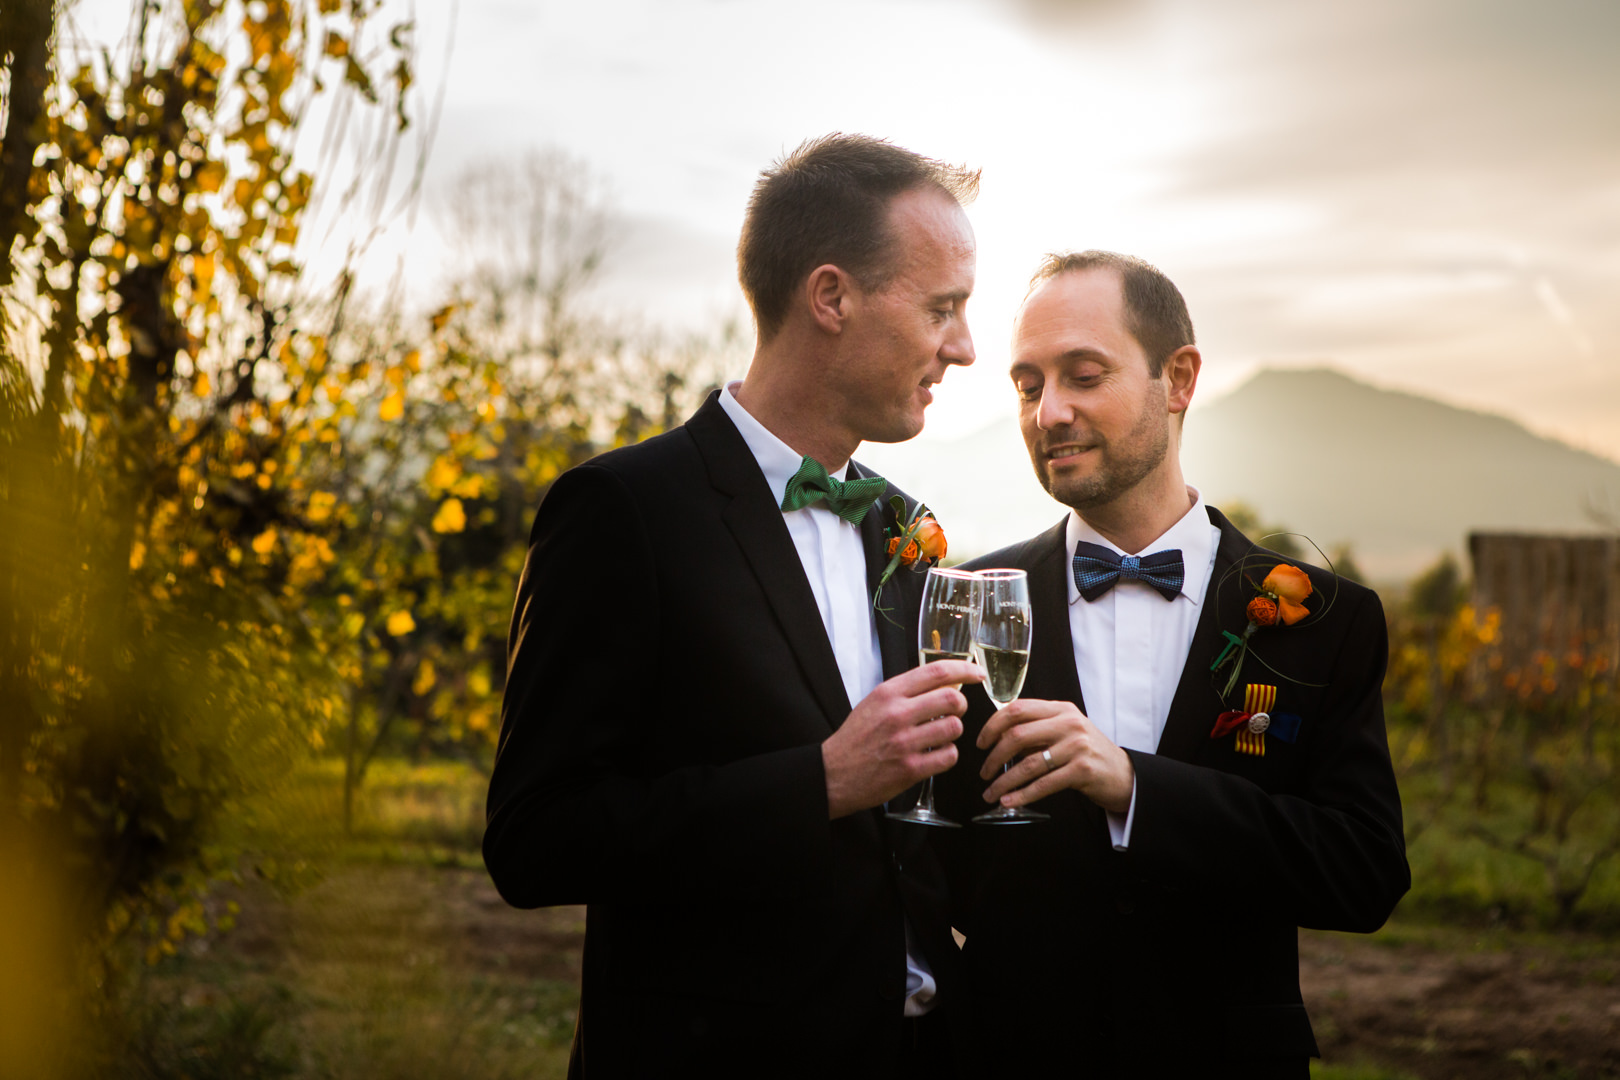 Same-sex-wedding-barcelona-boda- gay-samesex-engagement-Rafael-Torres-fotografo-bodas-sevilla-madrid-barcelona-wedding-photographer--46.jpg